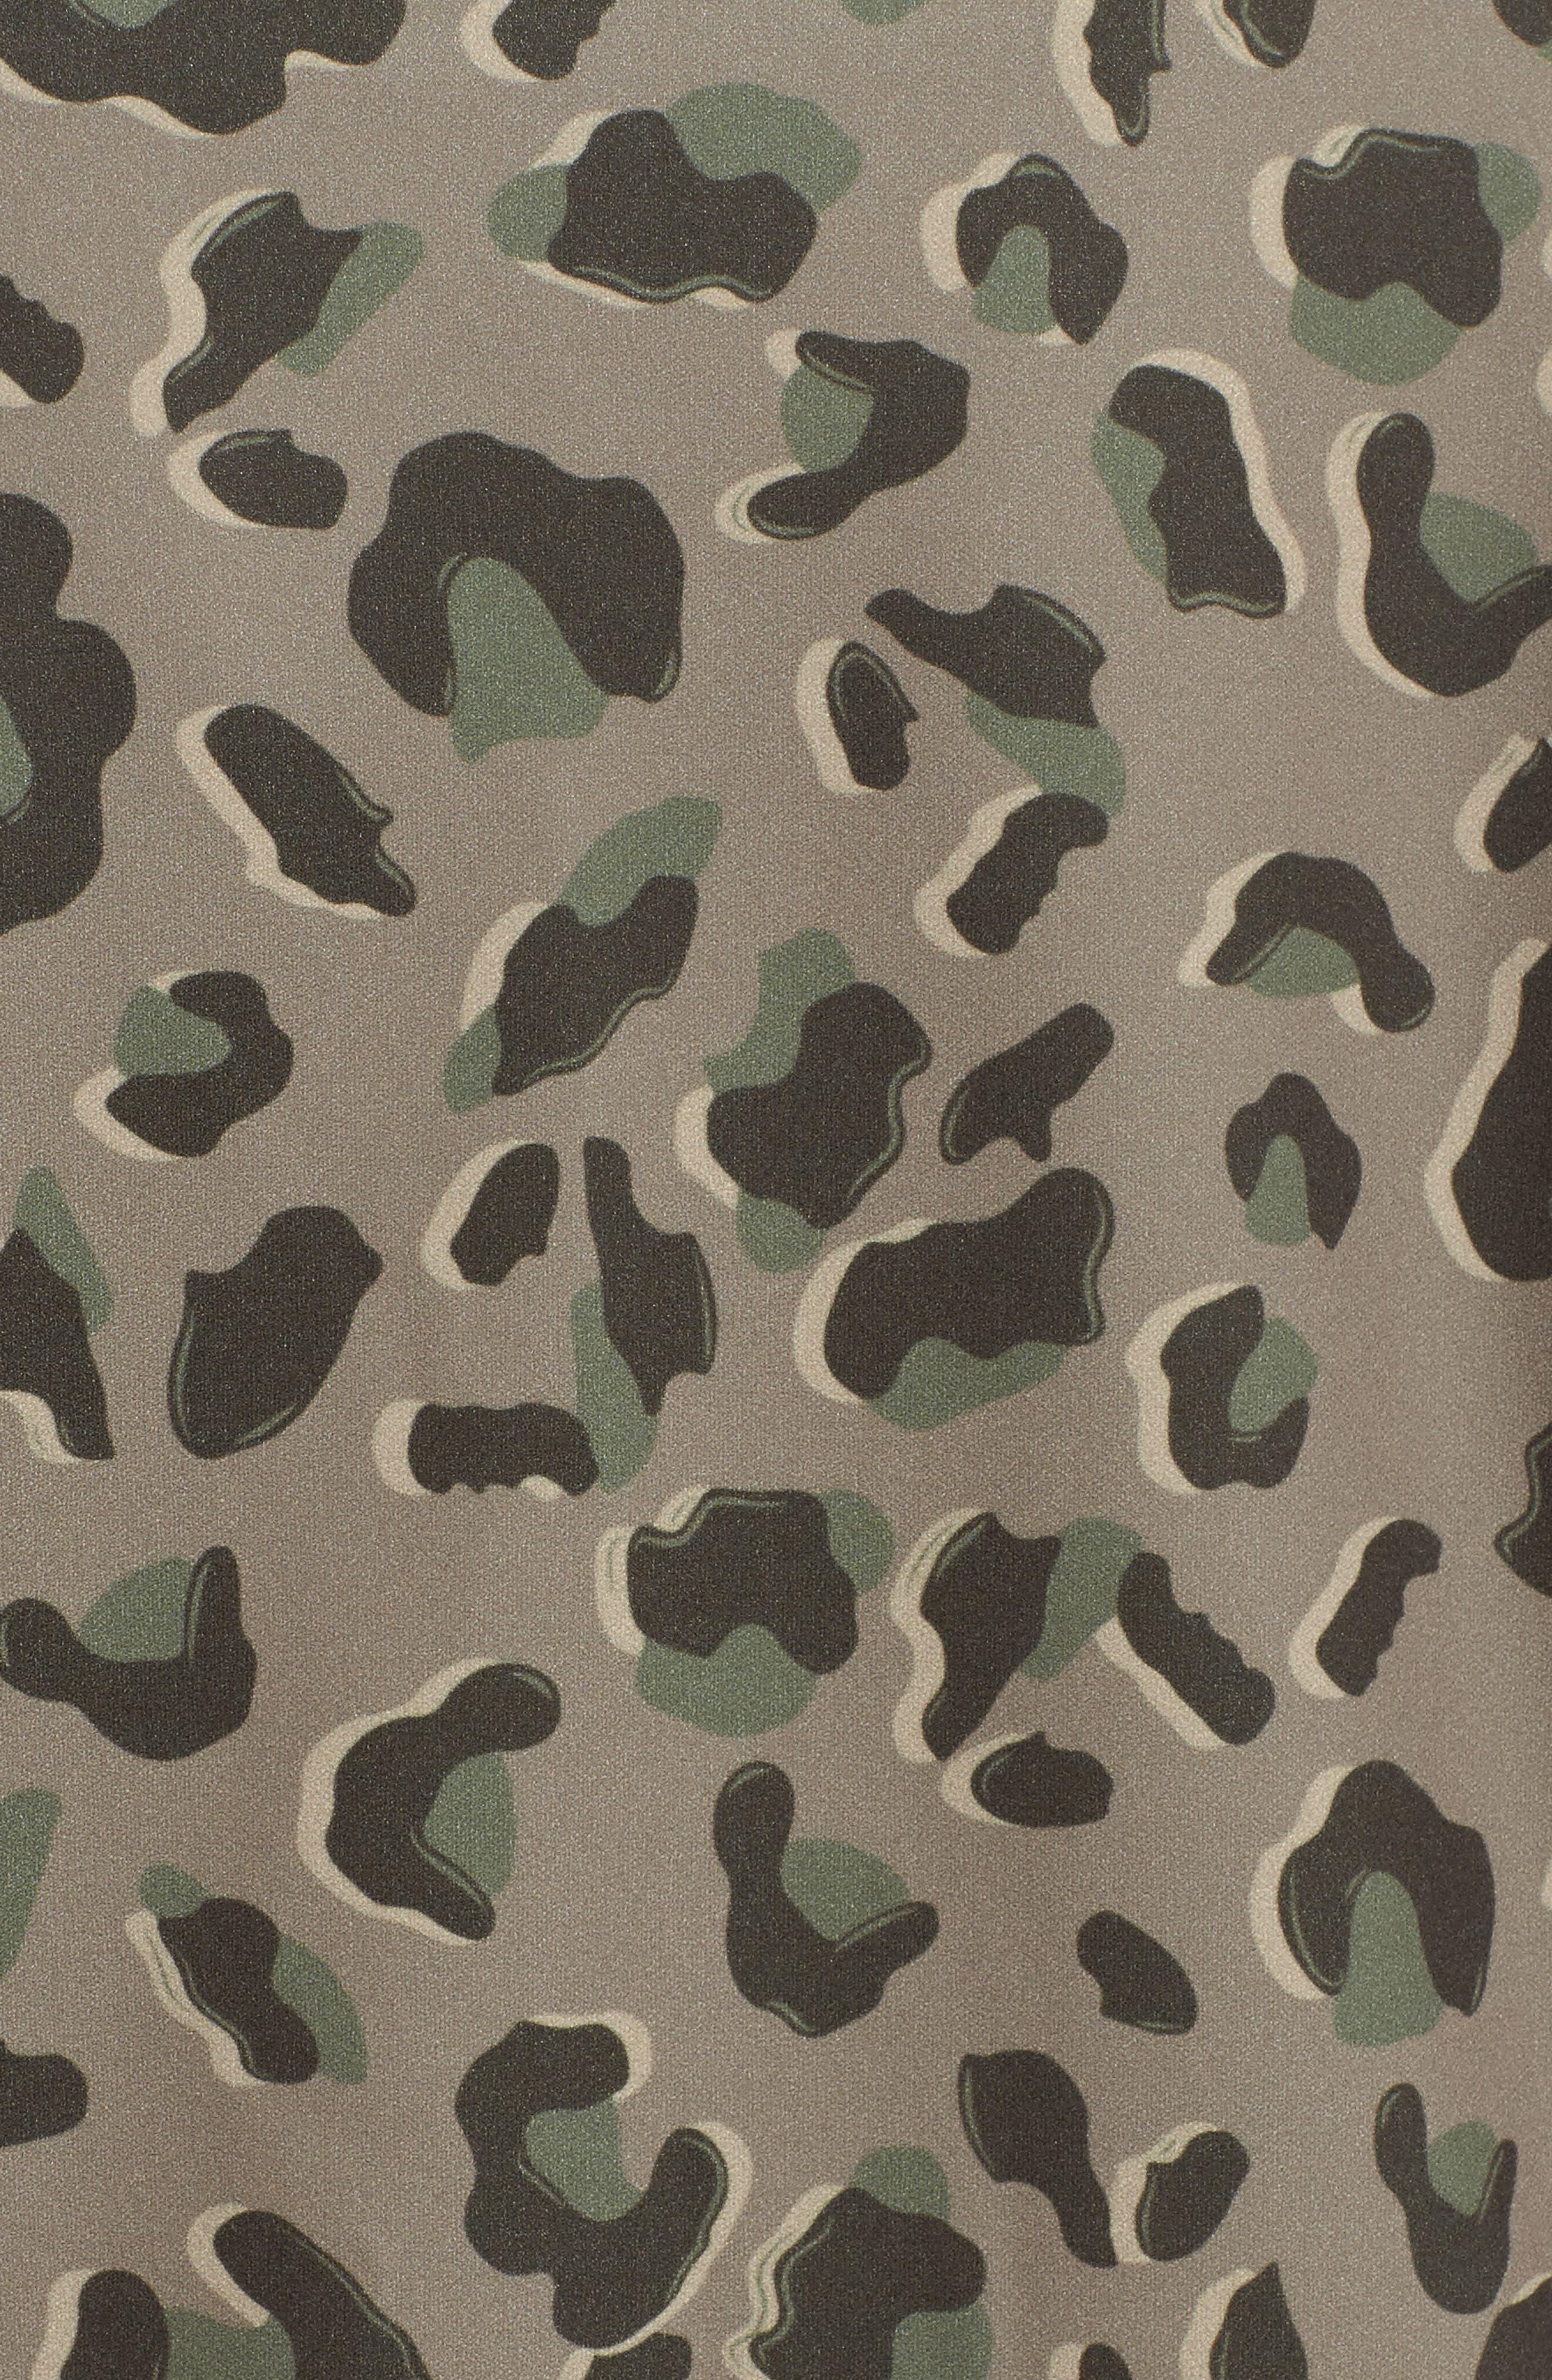 Osy Camo Print Jacket,                             Alternate thumbnail 6, color,